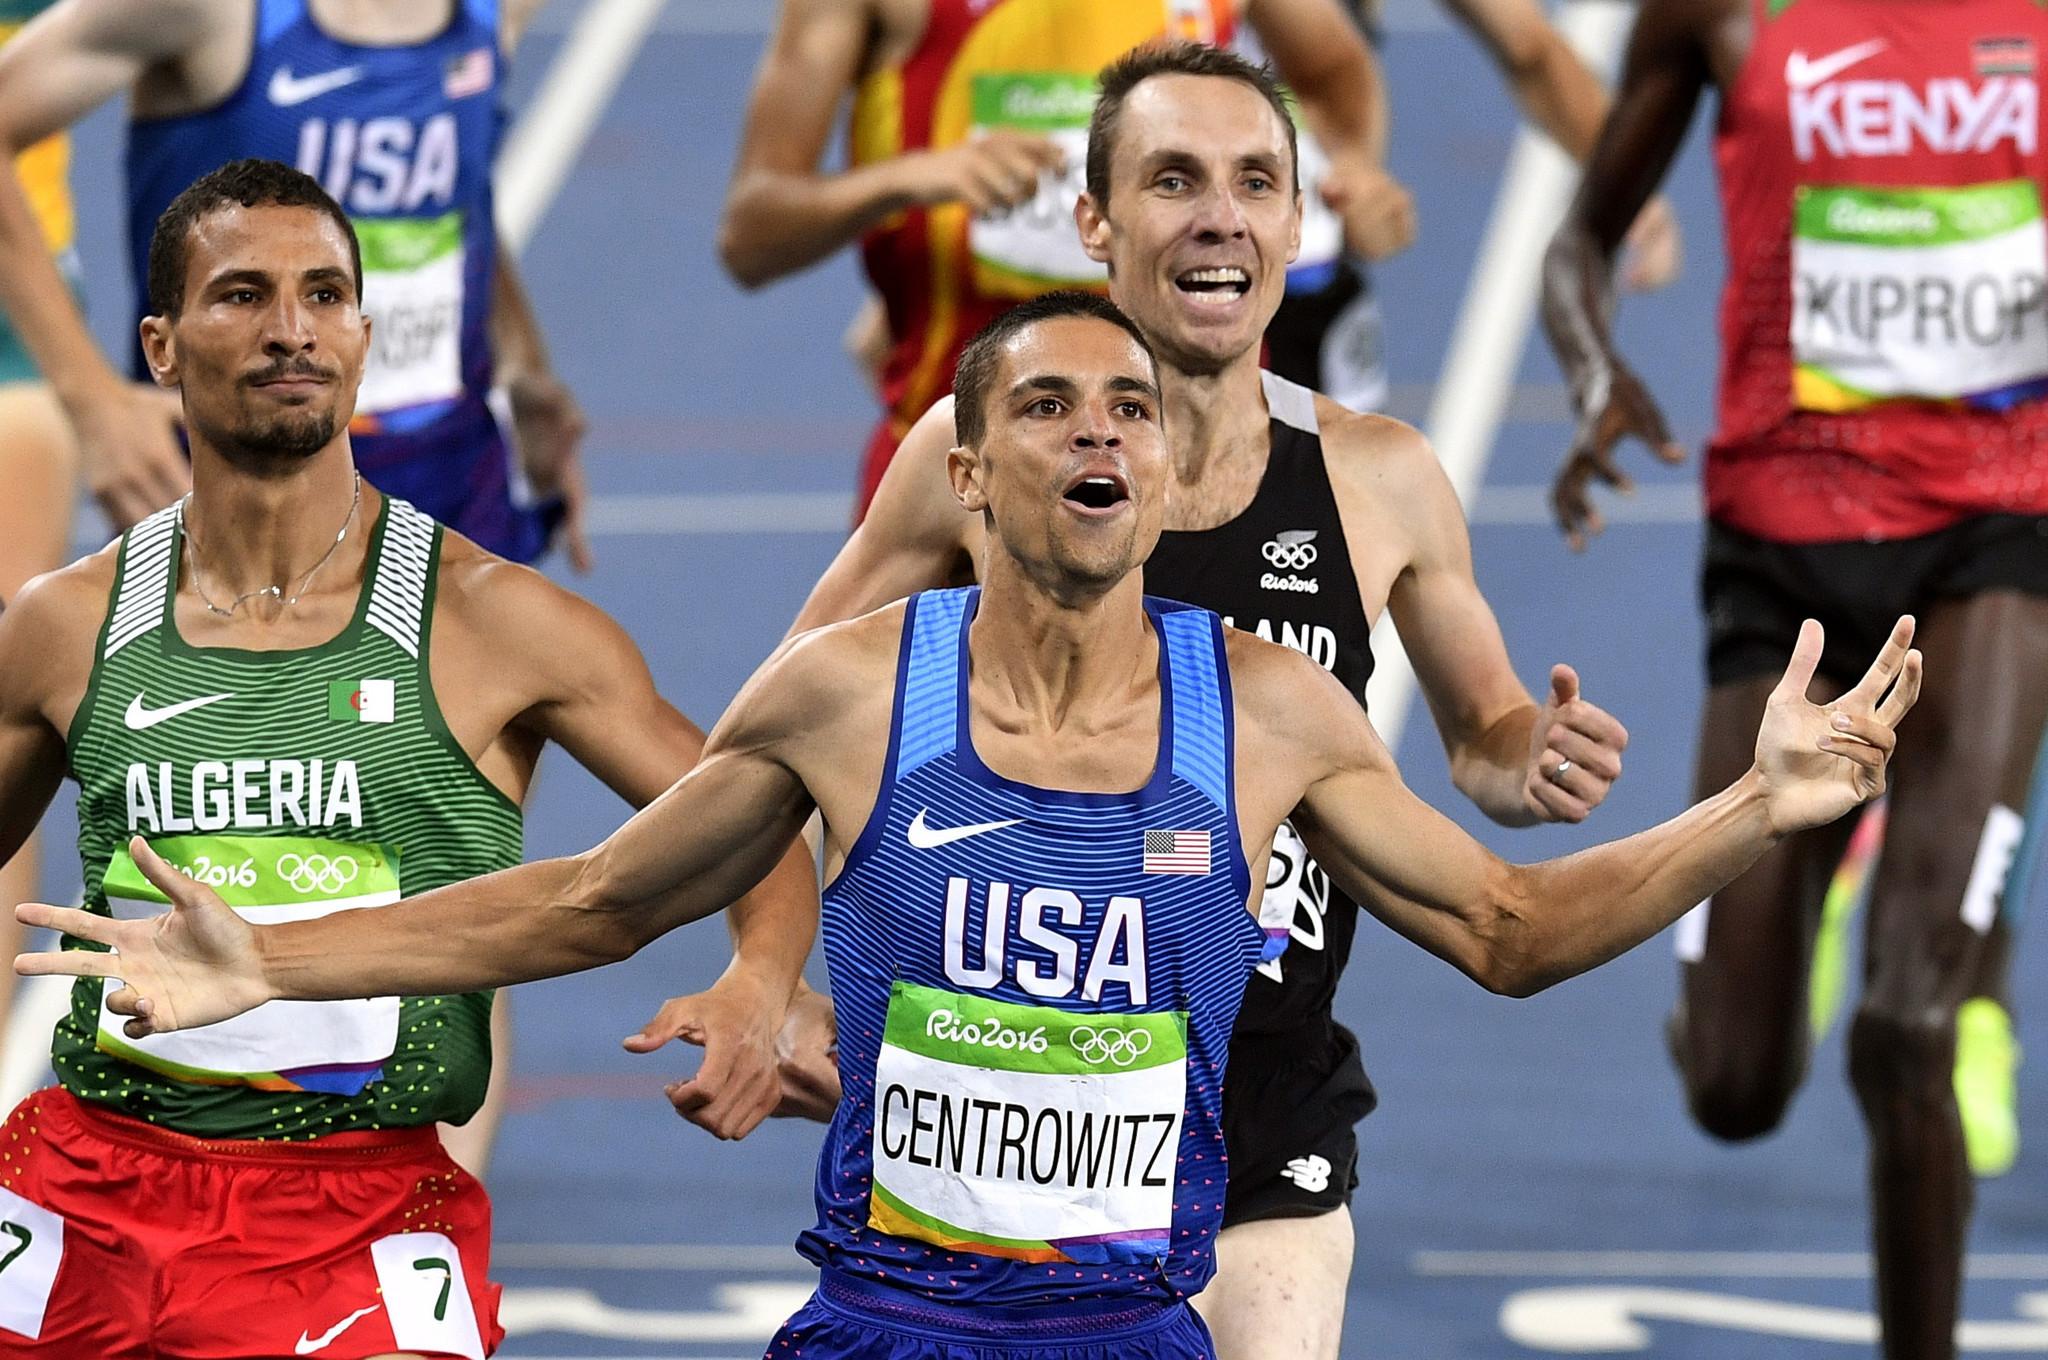 135e91b62916 Broadneck grad Matthew Centrowitz races to gold in 1